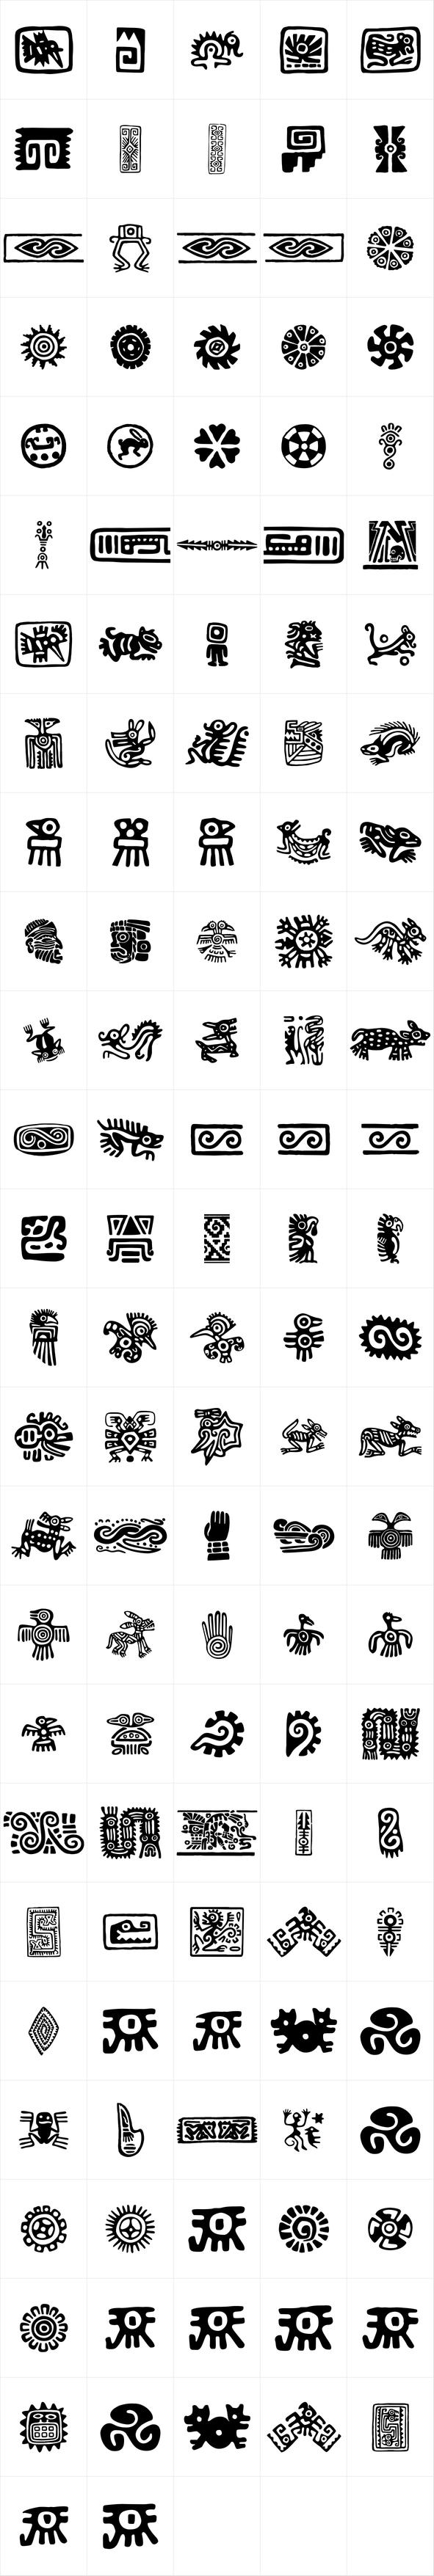 P22 Mexican Relics Symbol Icon Fonts Pinterest Mexicans